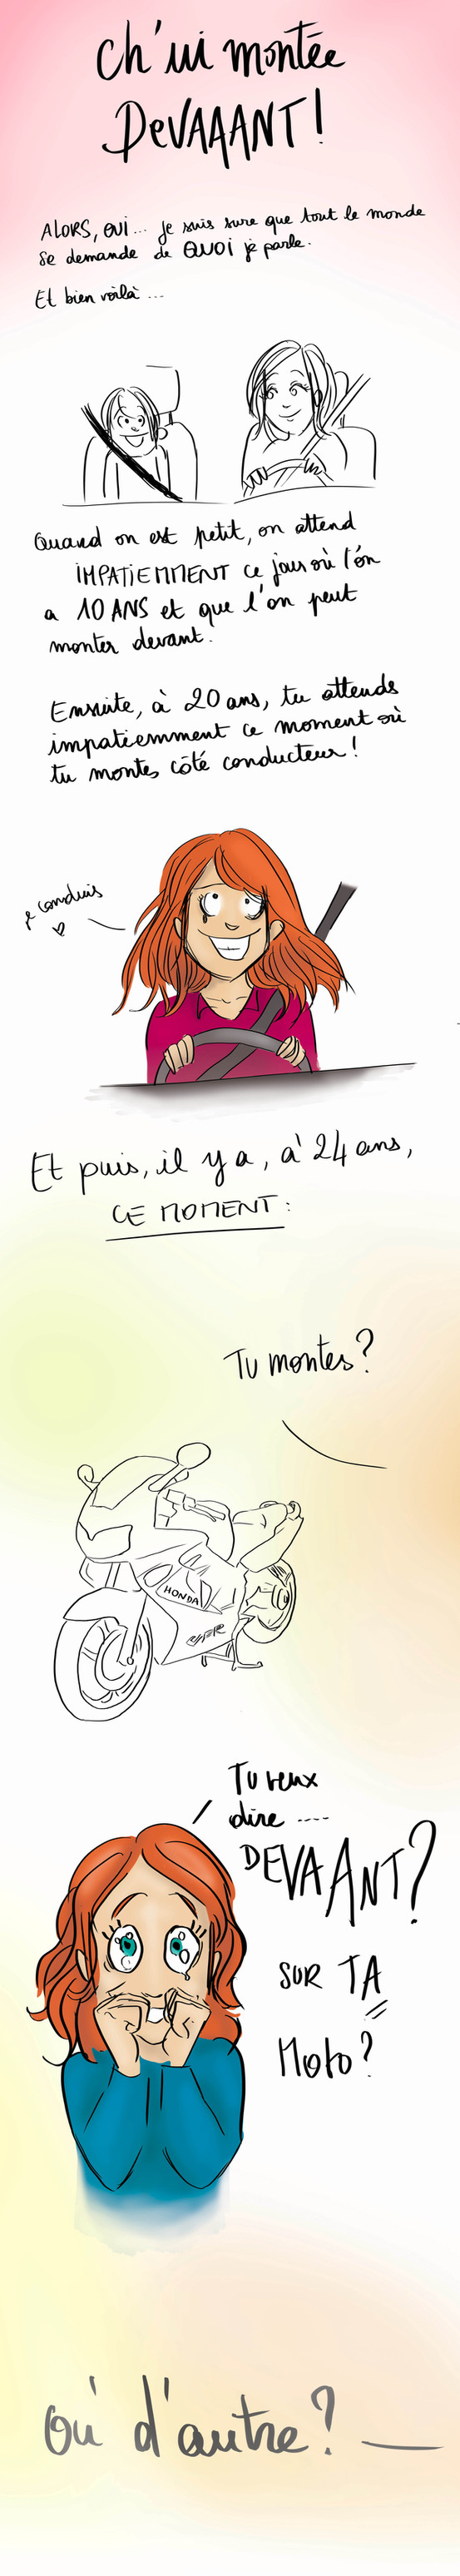 Ch'ui montée devaaant !!!